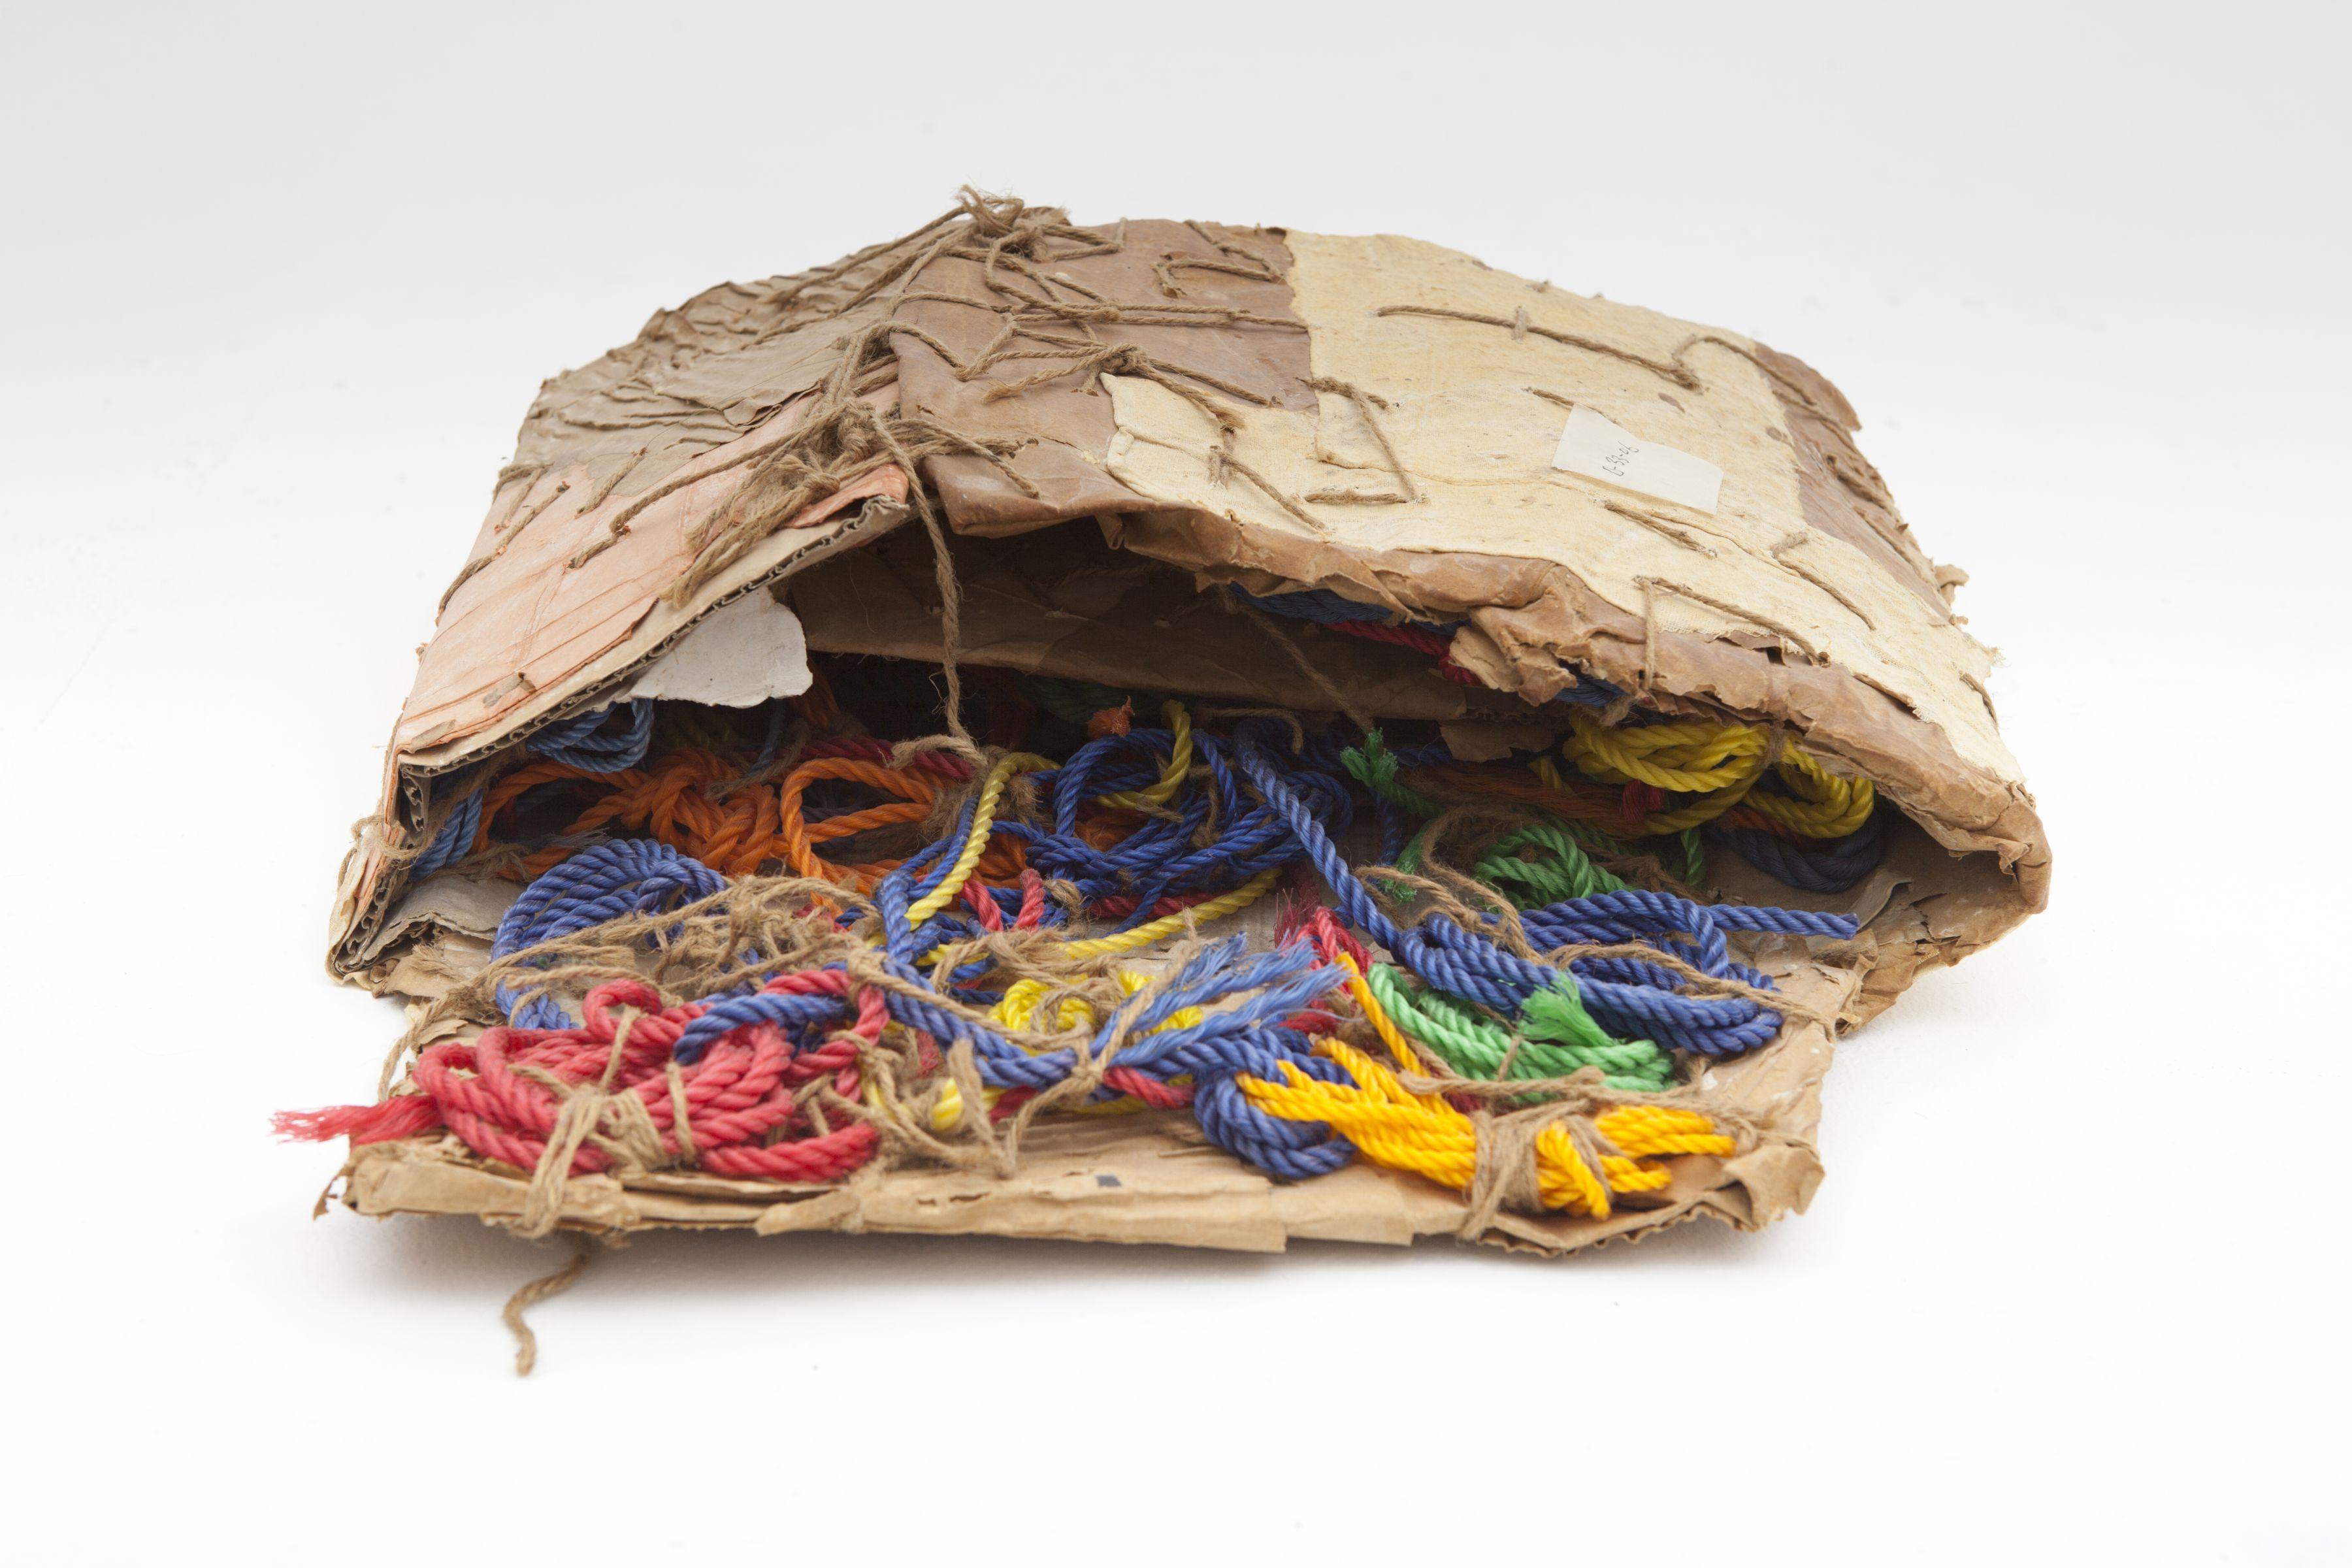 Cardboard, Plastic Rope & Jute, 2006, Mixed media